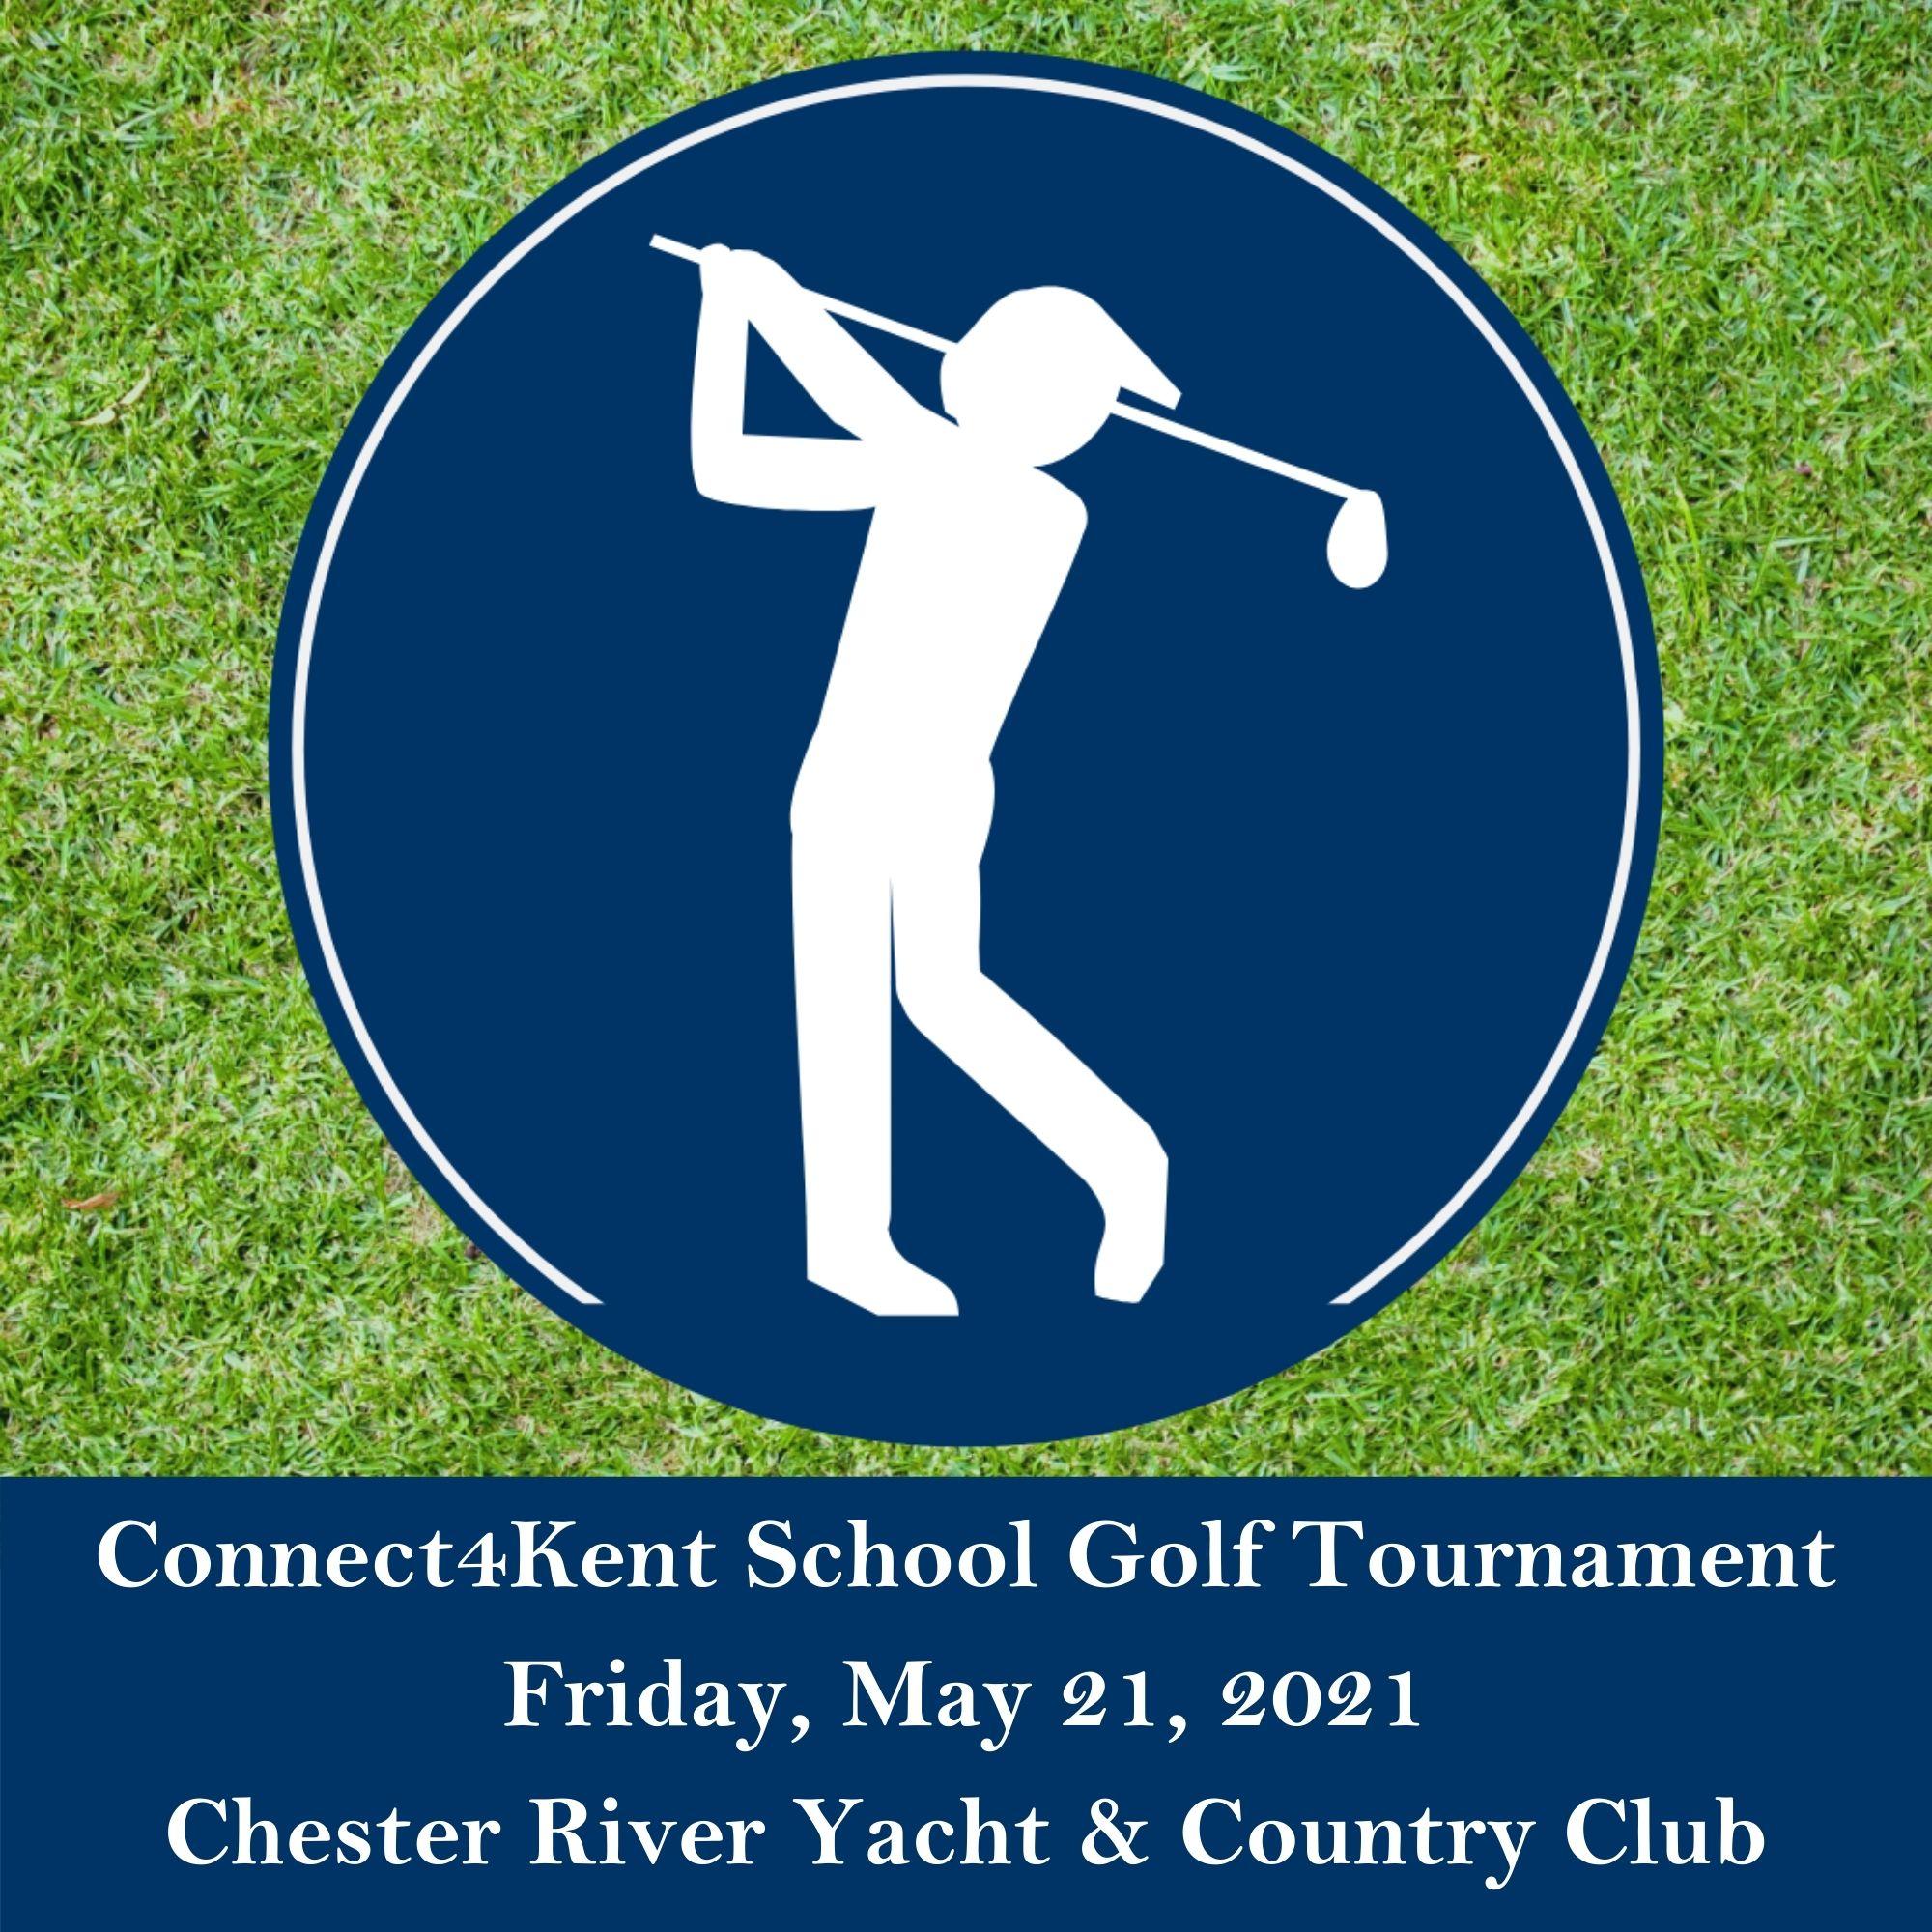 Connect4Kent School Golf Tournament